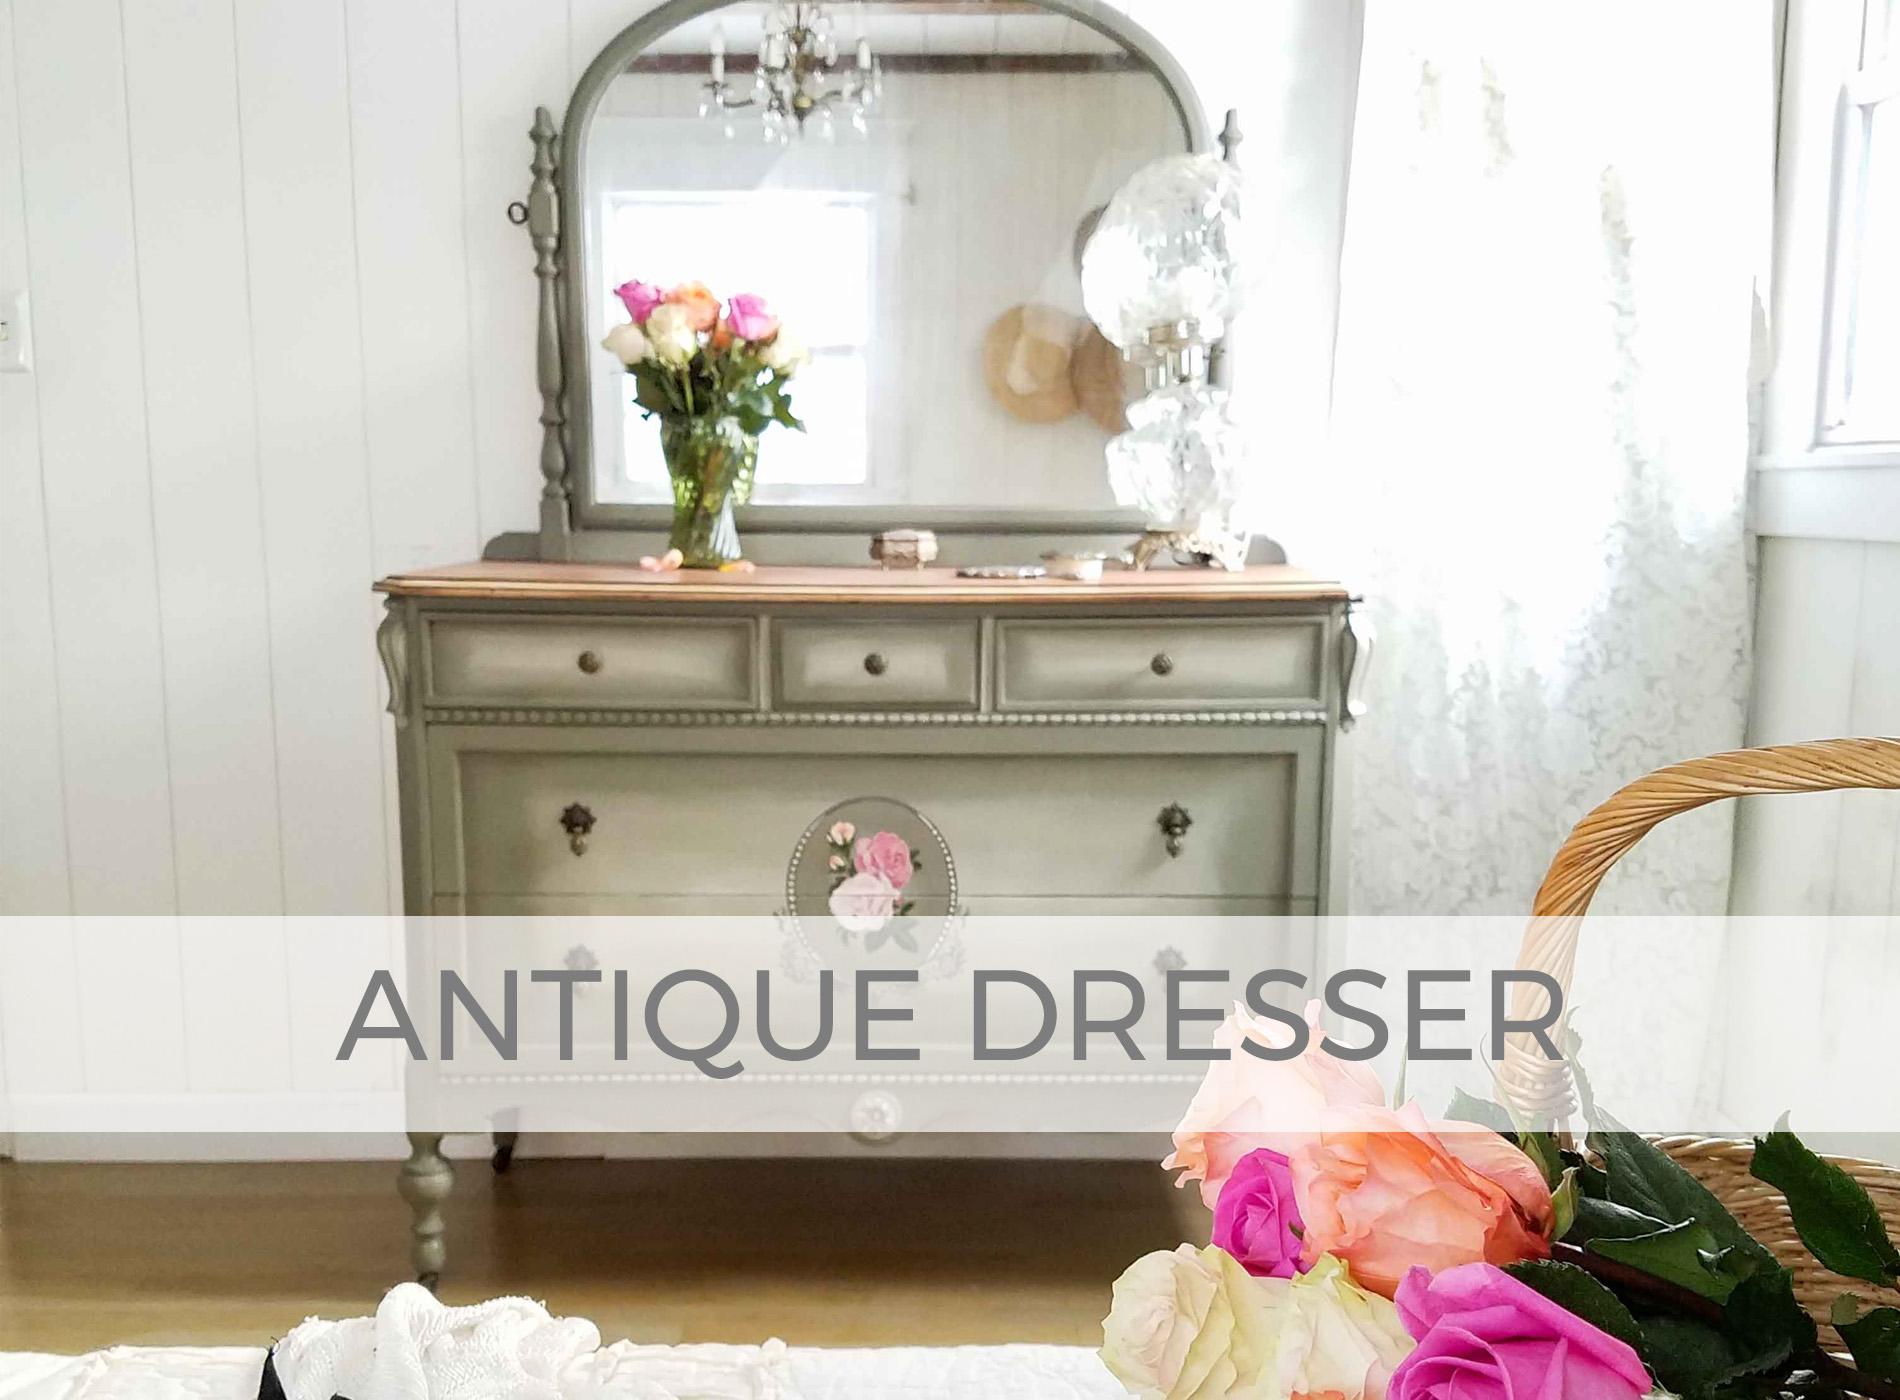 Antique Dresser by Larissa of Prodigal Pieces | prodigalpieces.com